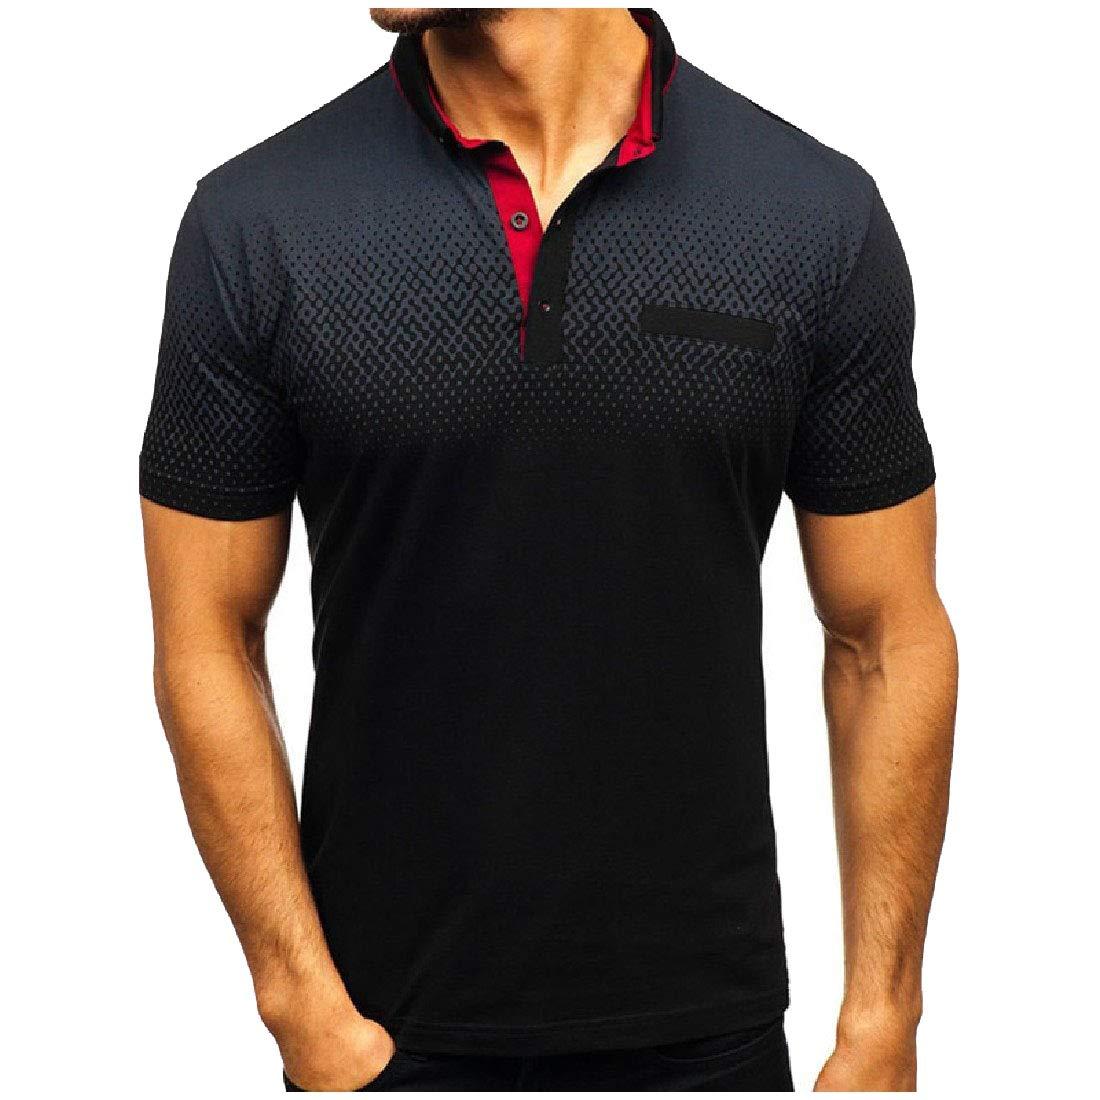 DressUMen x 3D Print Turn-Down Collar Polo Short Sleeve Tunic Tops T-Shirt